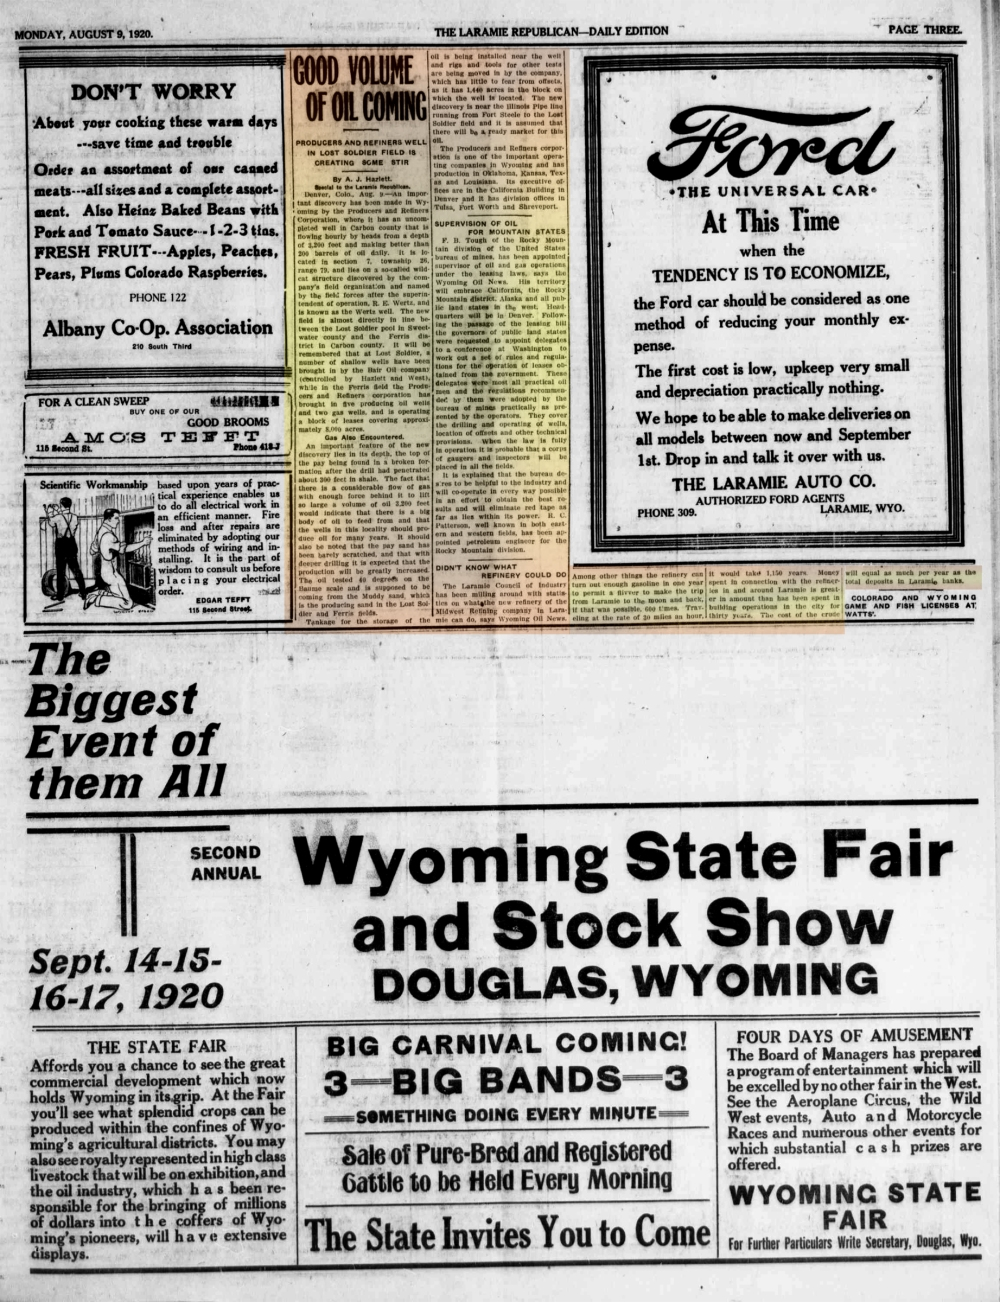 Laramie Republican 9thAugust1920 page 3.